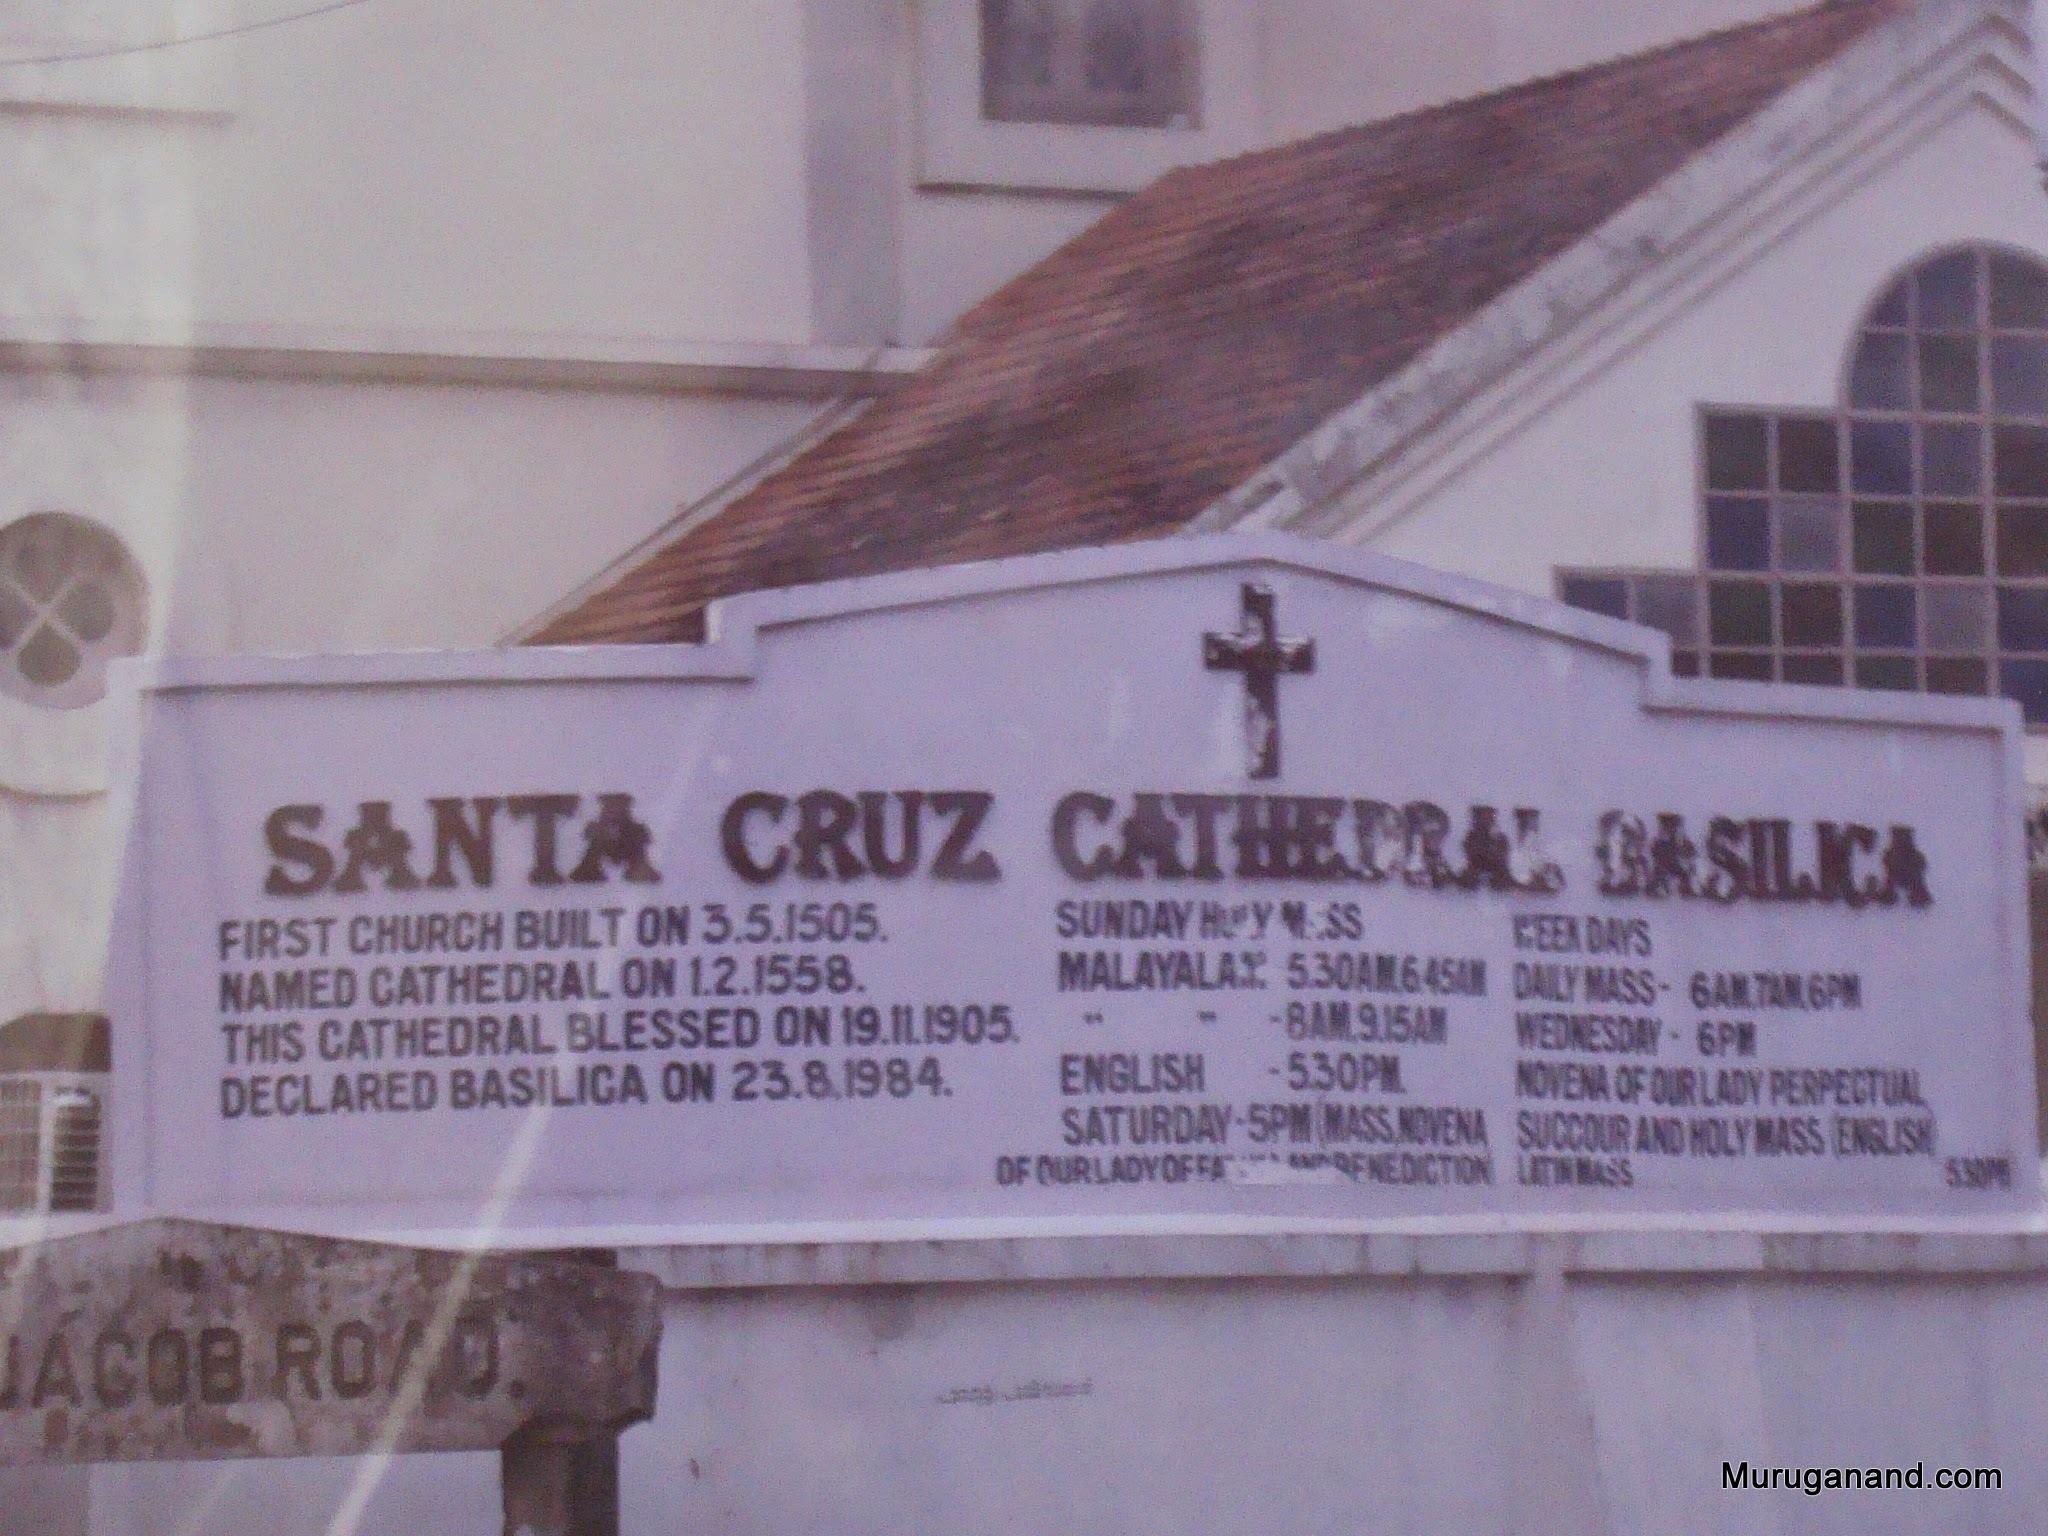 Santa Cruz Cathedral- also an old church built in 1505